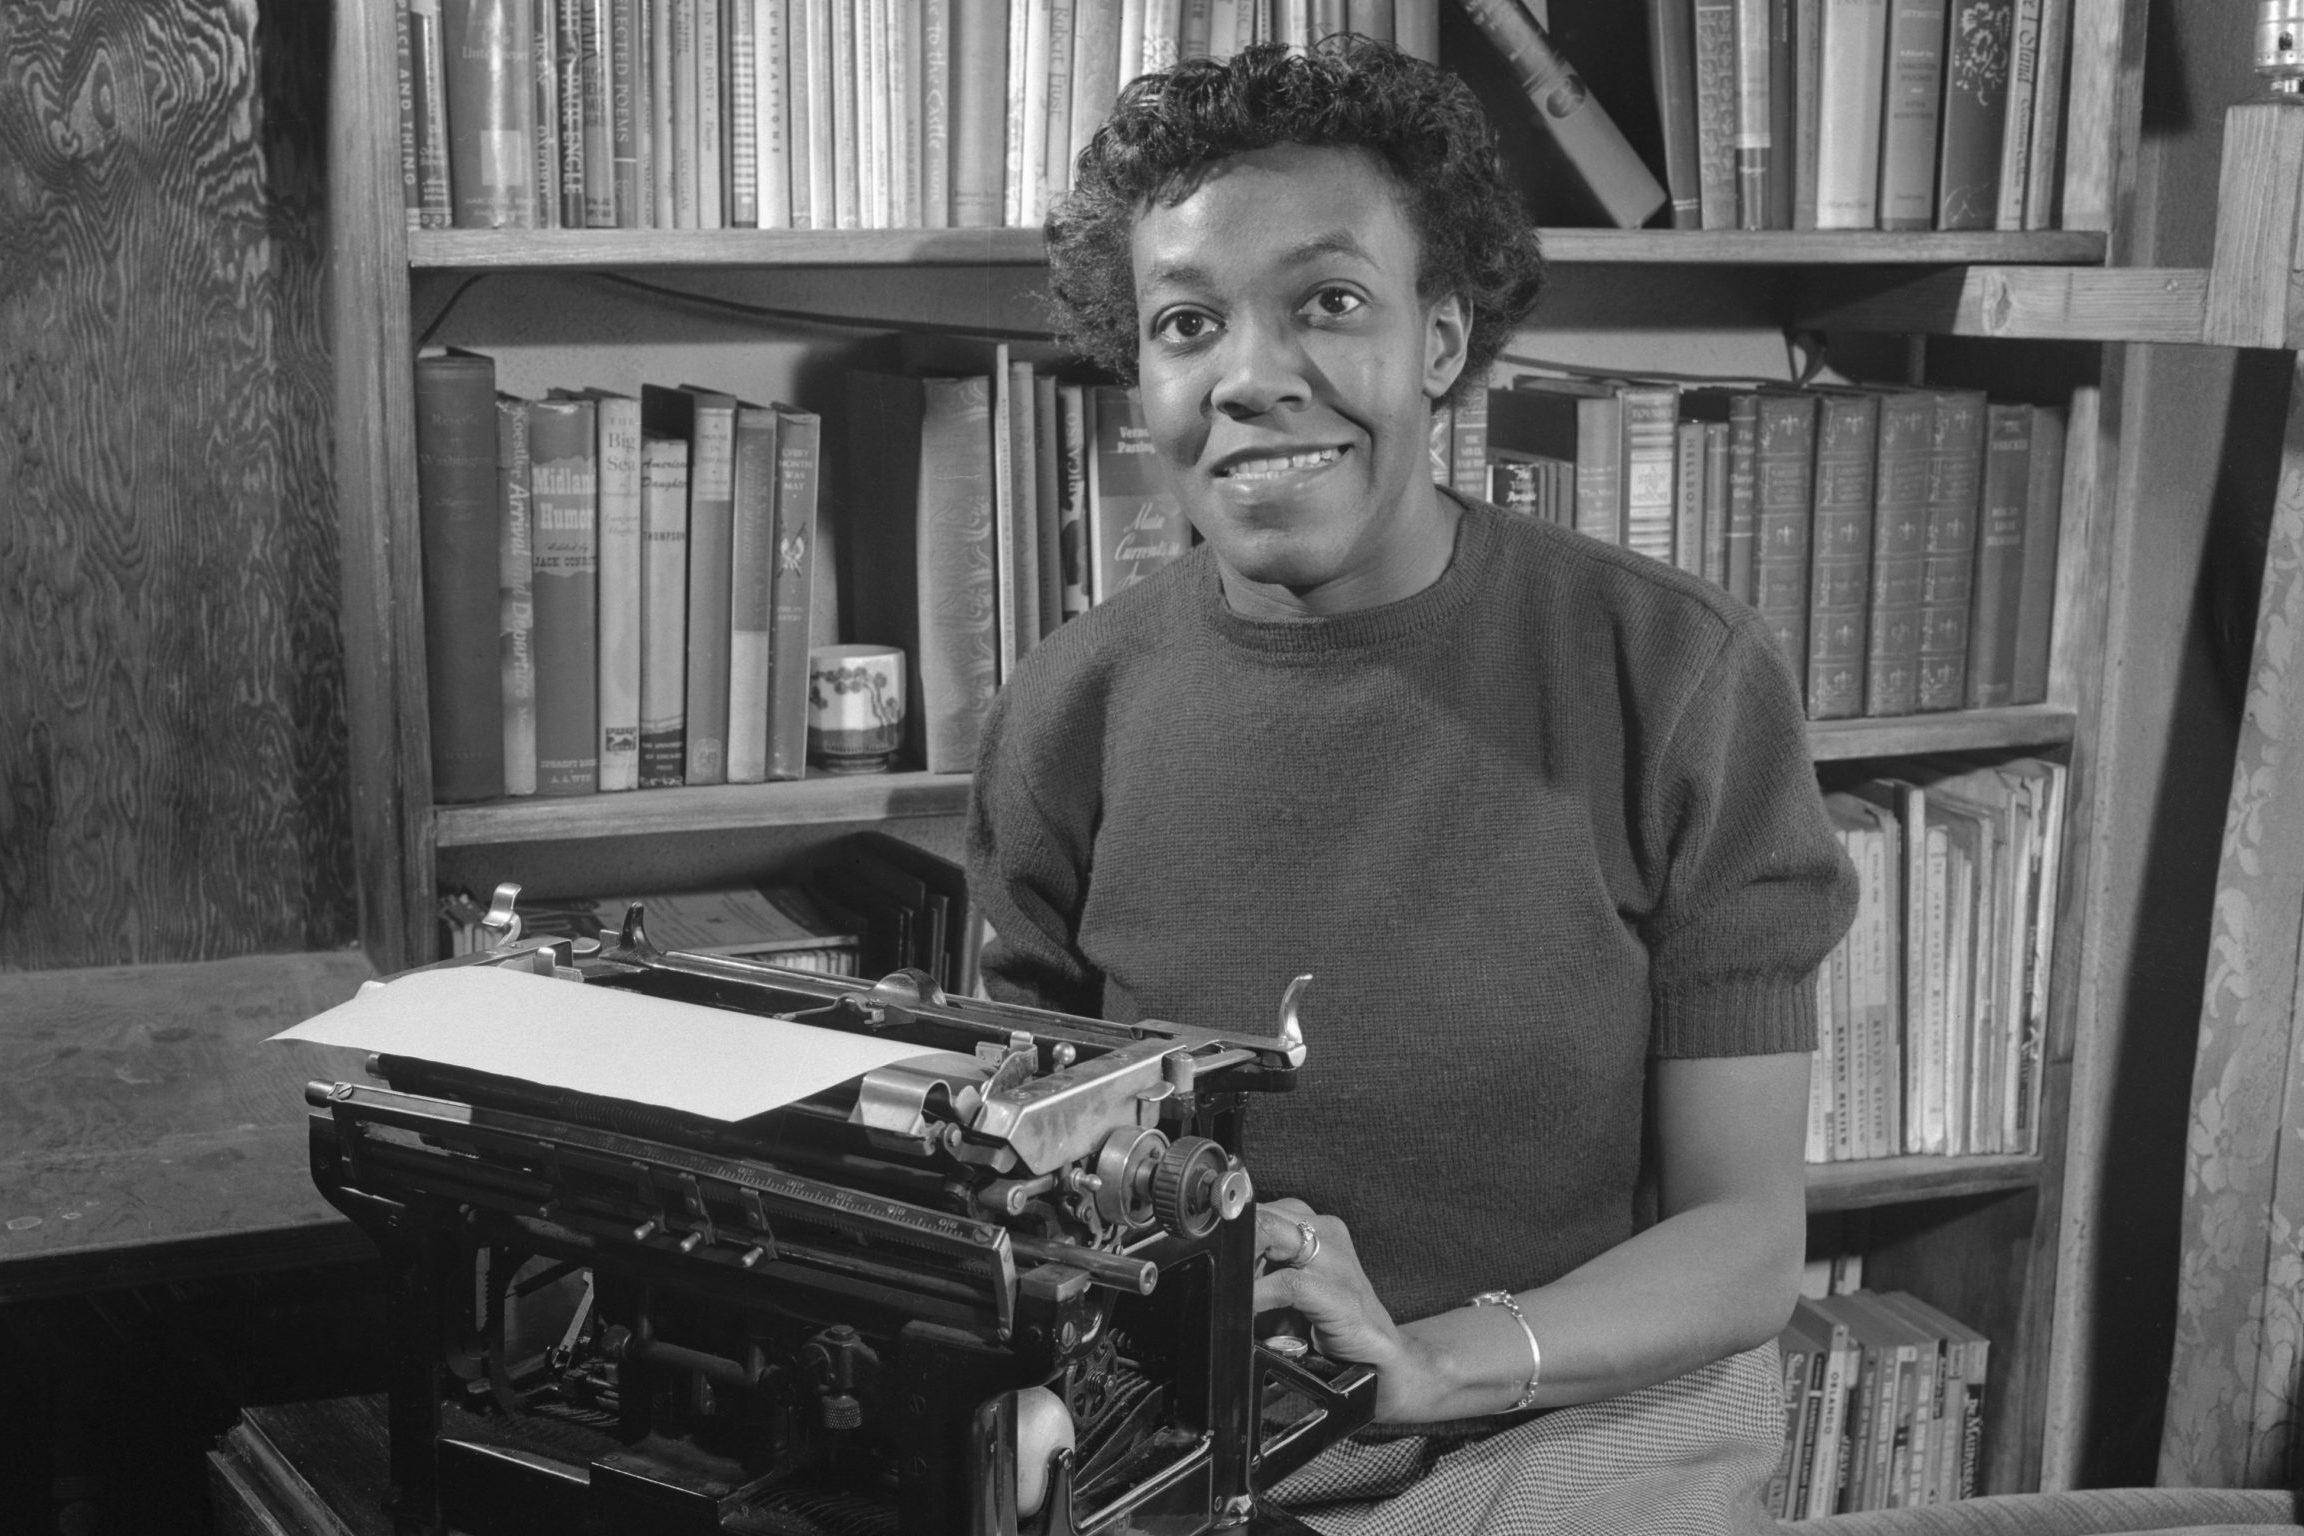 Gwendolyn Brooks with Typewriter